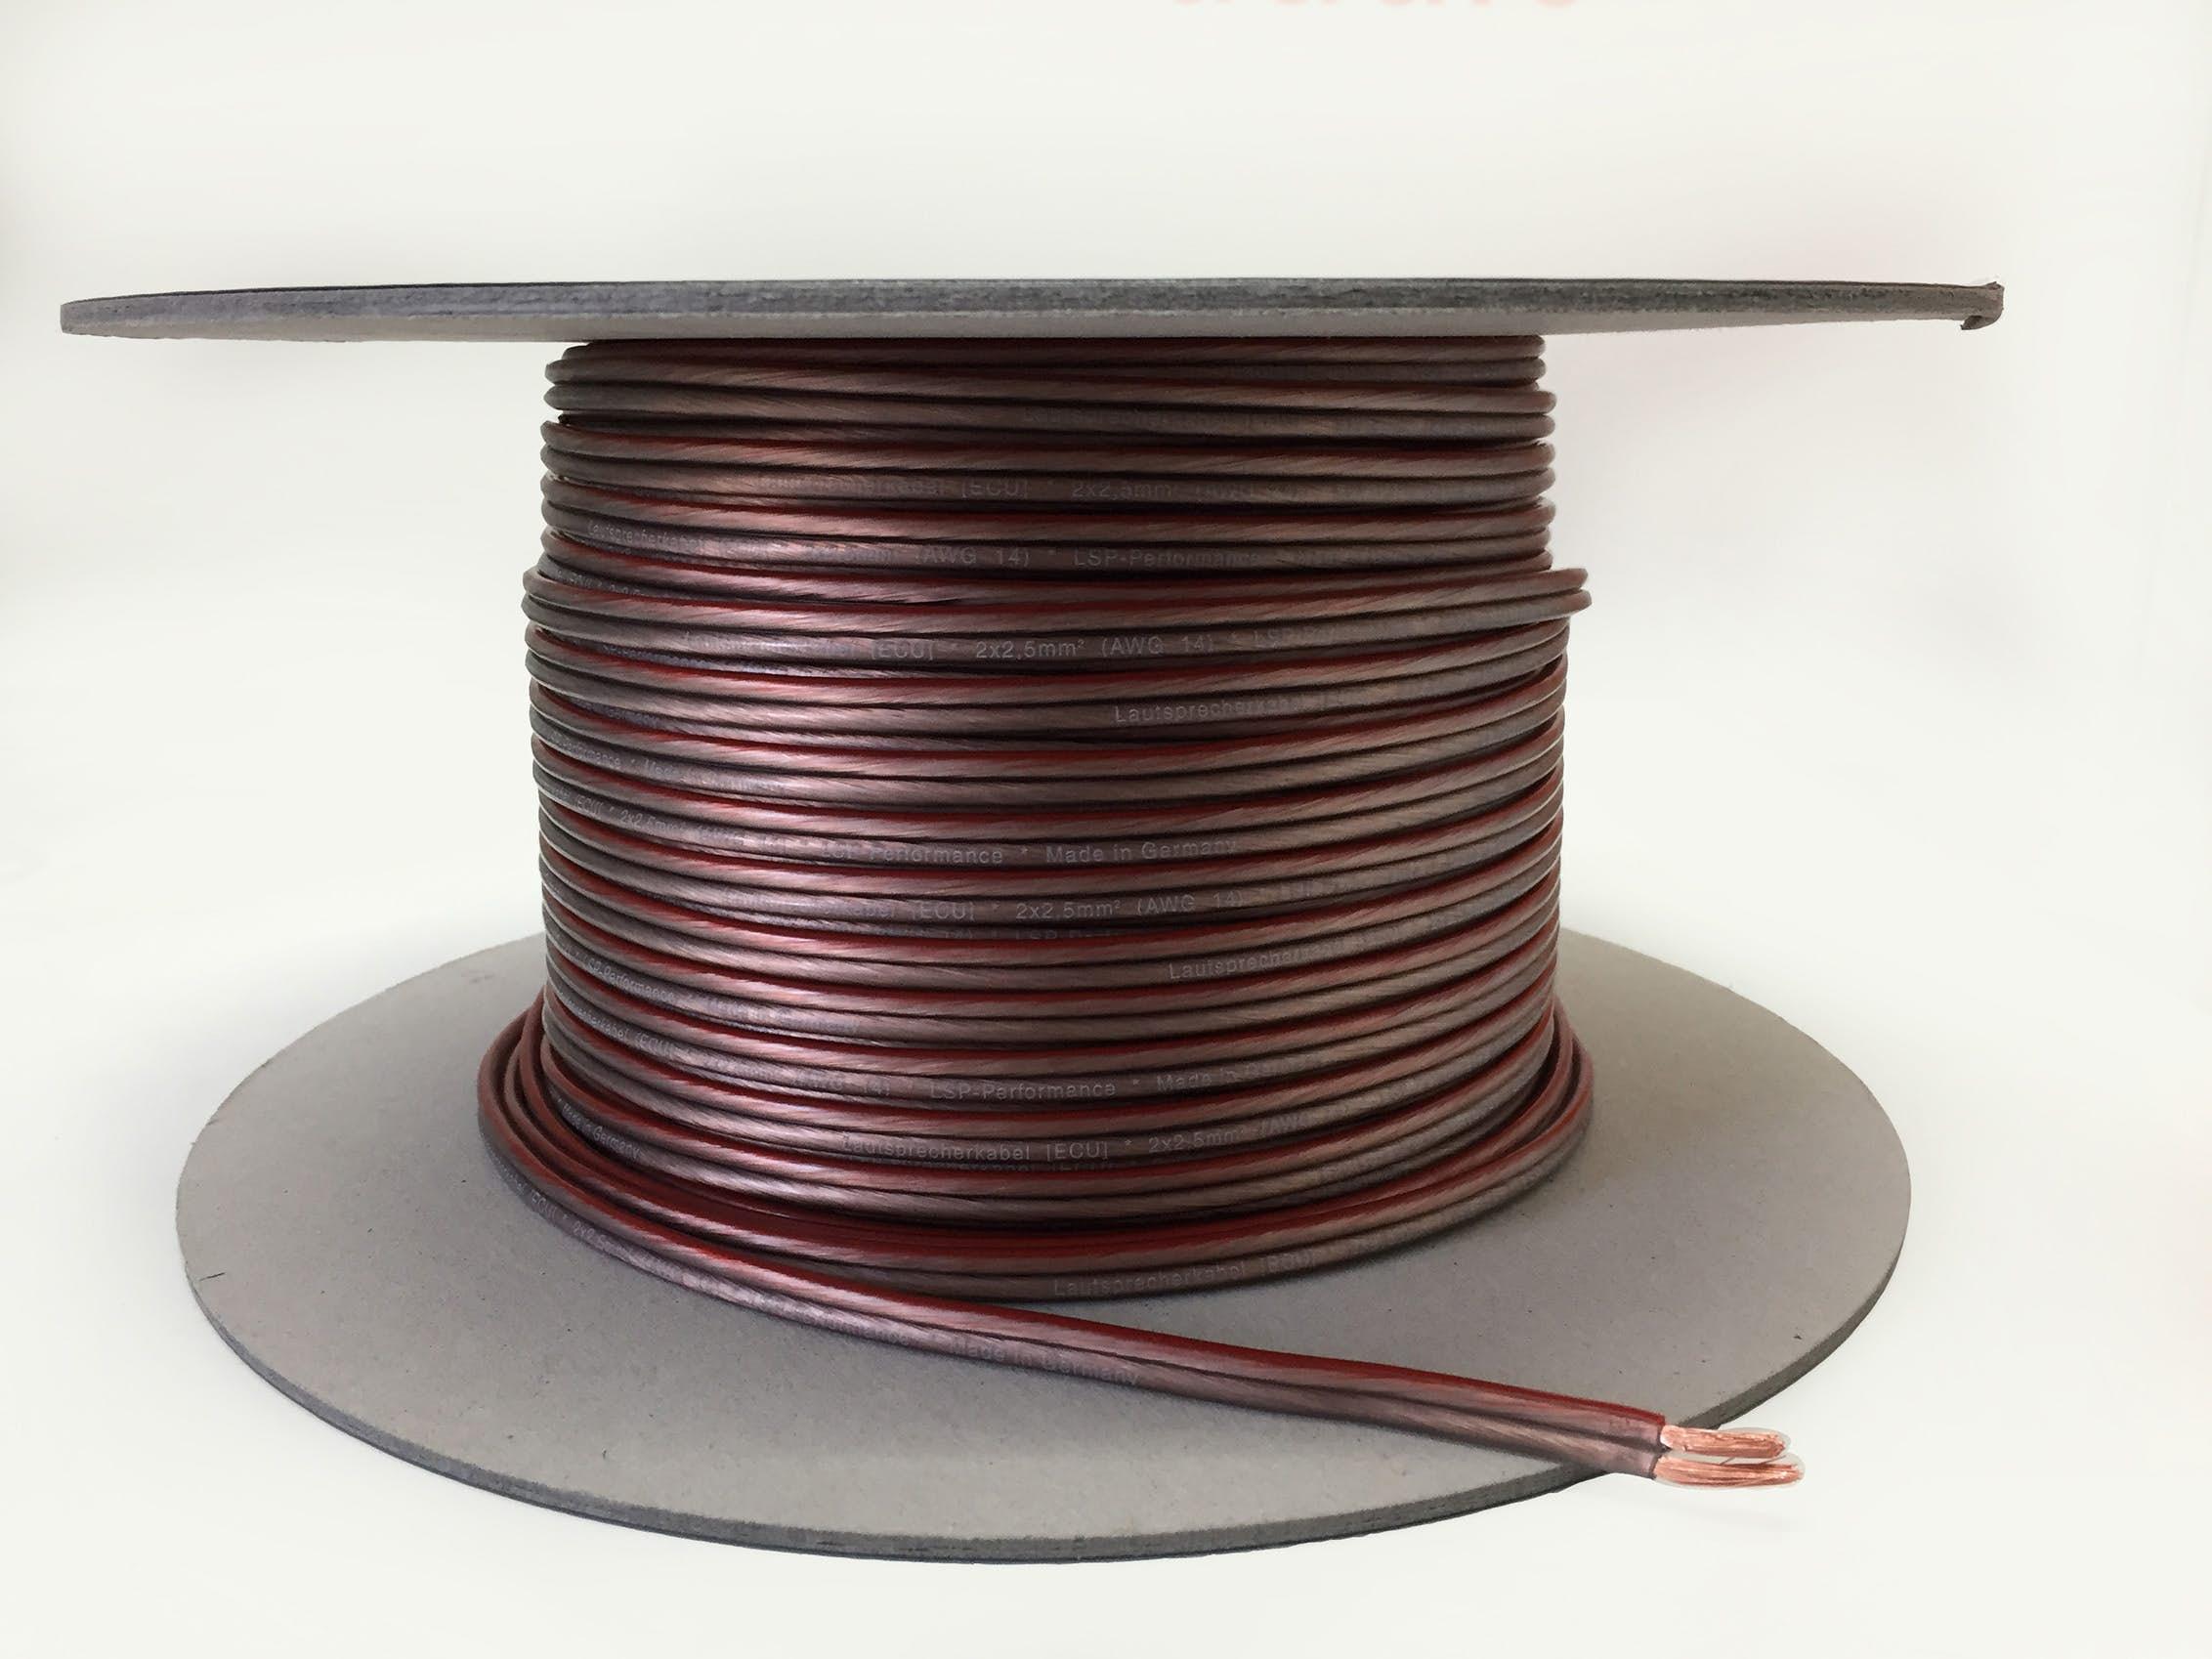 Zvočniški kabel 2 x 2,5 mm - High Quality OFC Copper